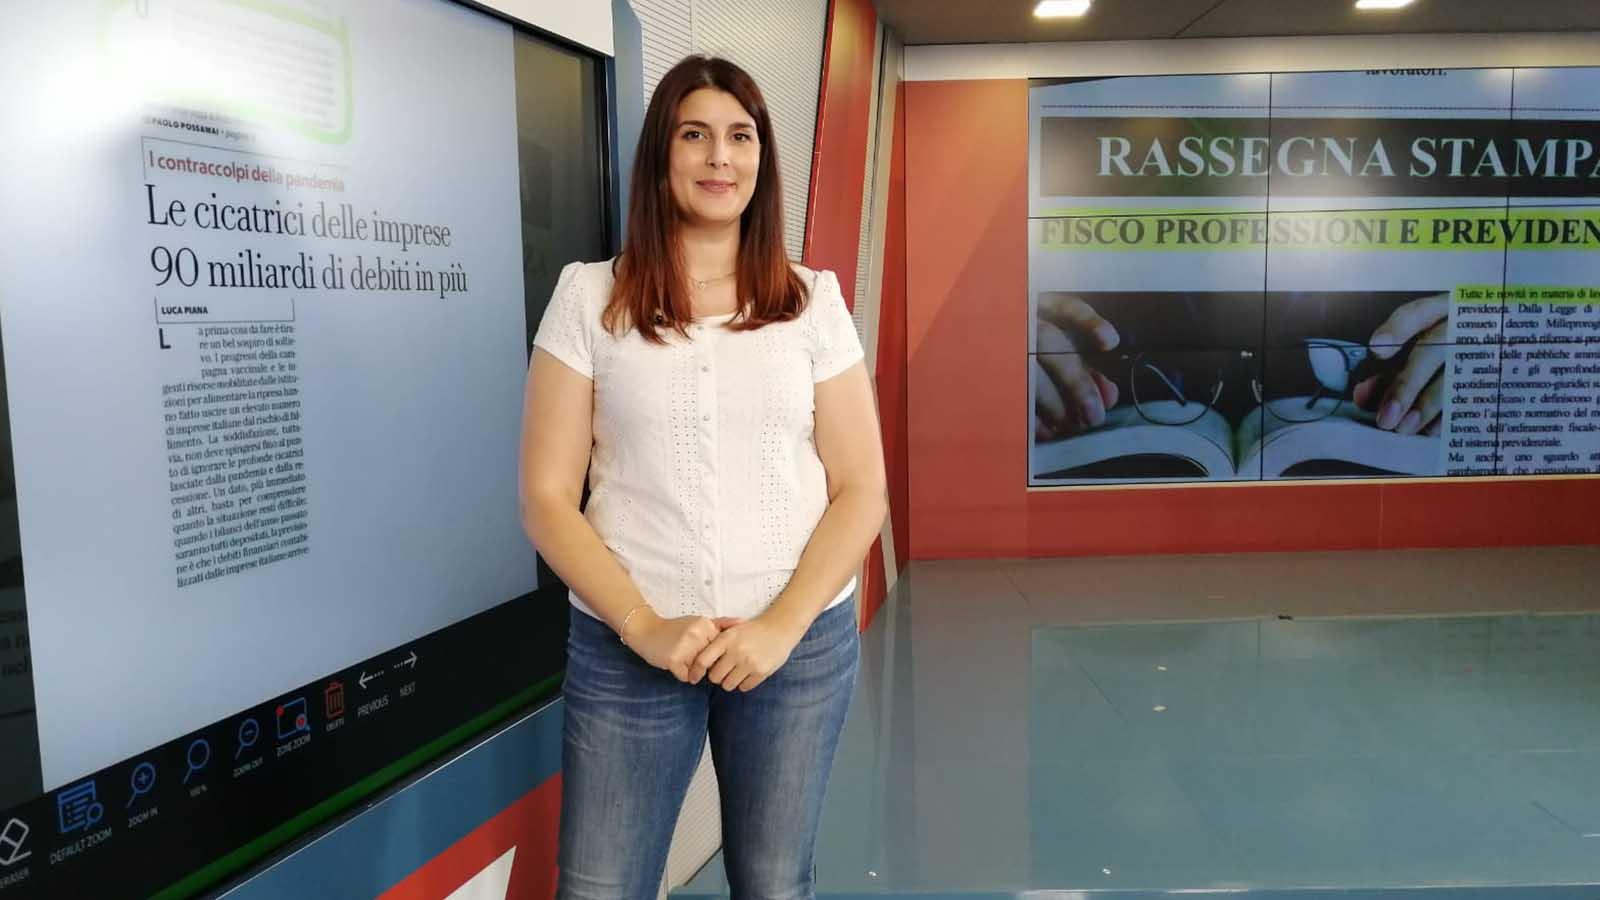 Rassegna Stampa - 14.06.2021